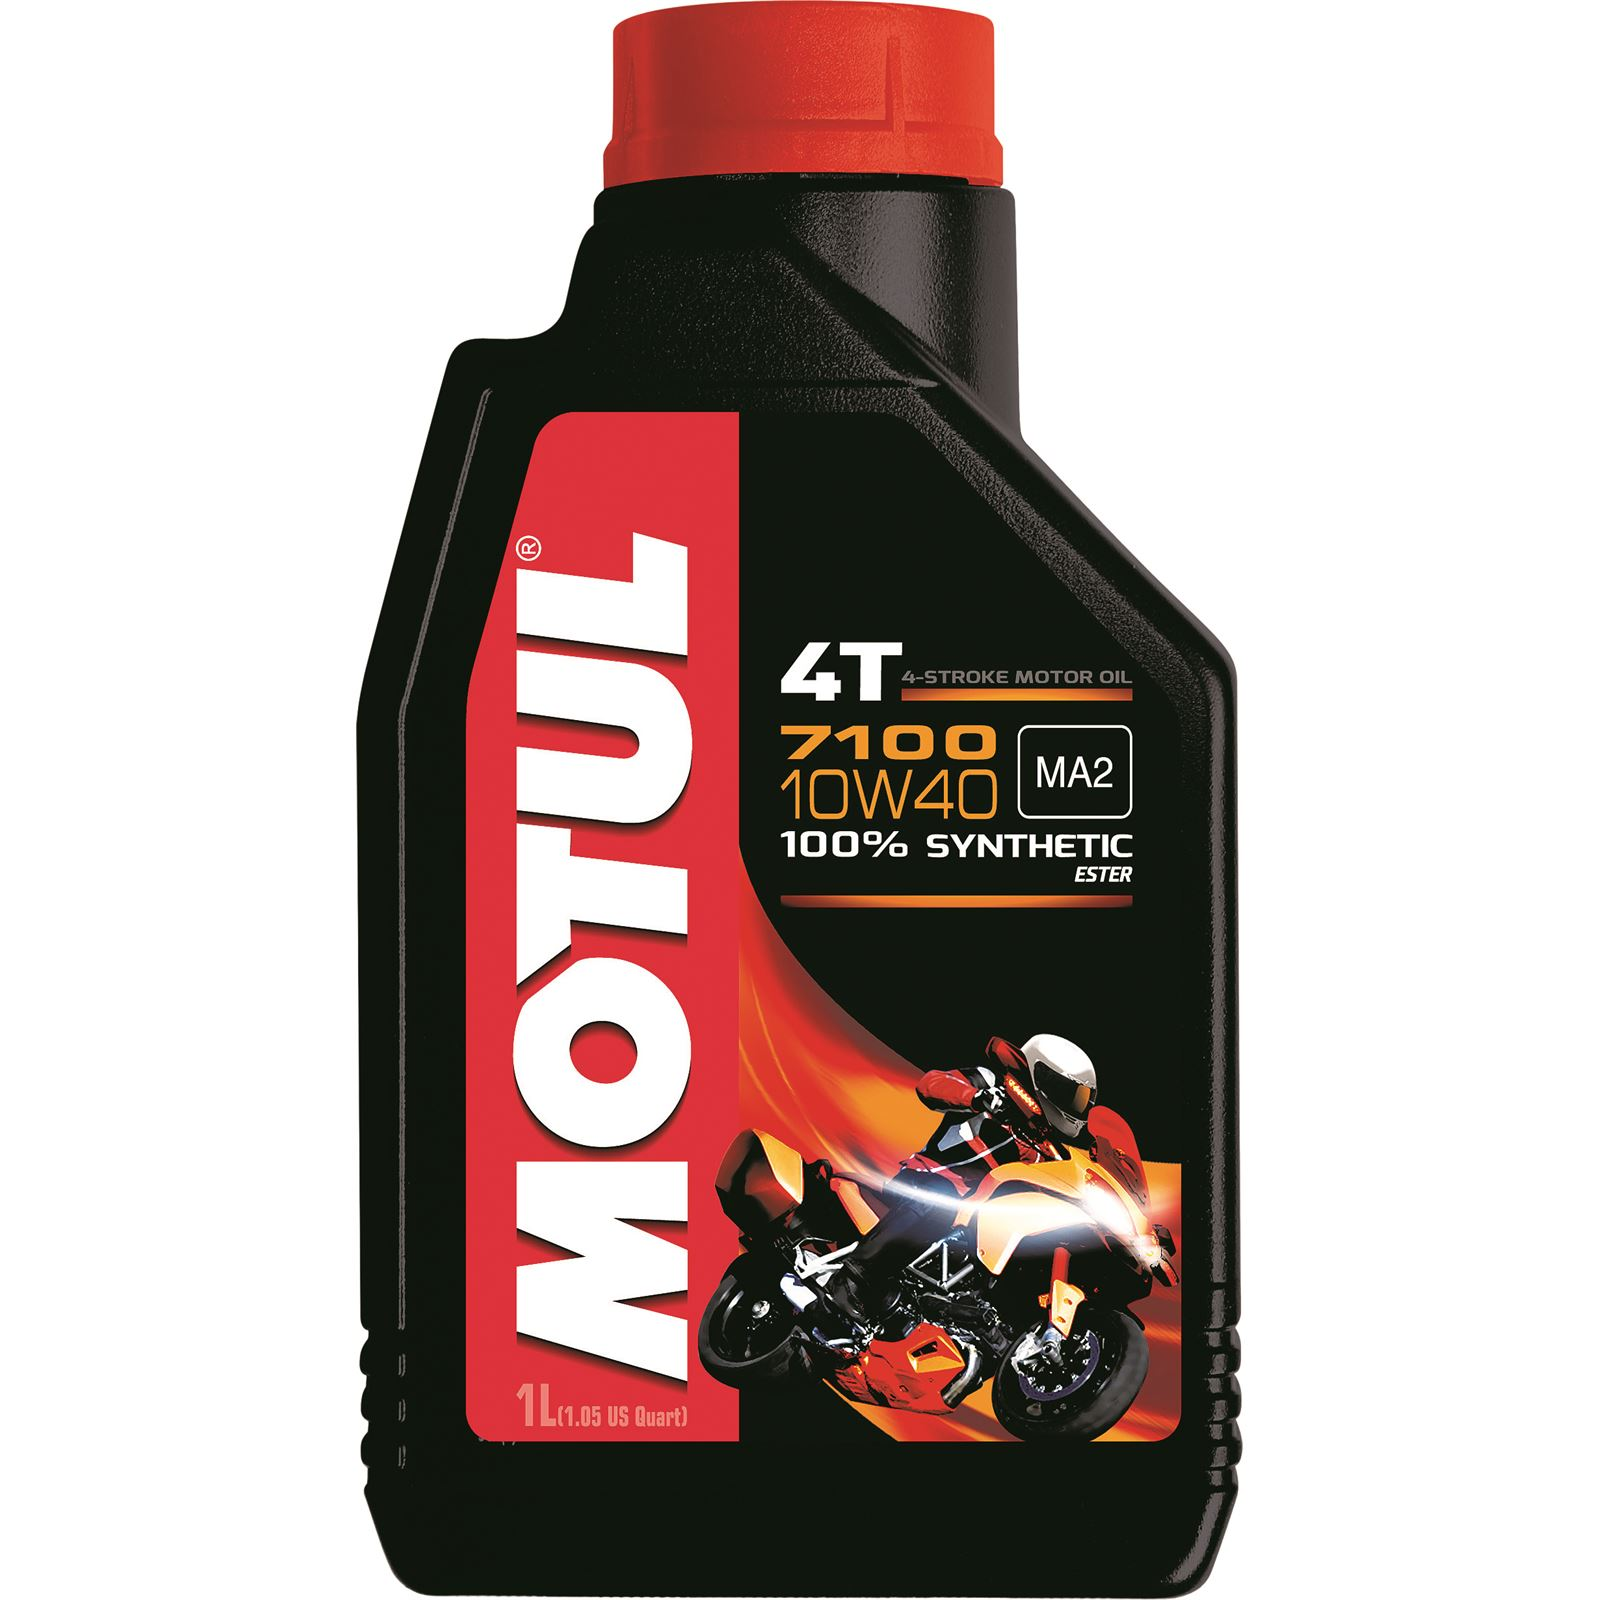 Motul 7100 4T Oil